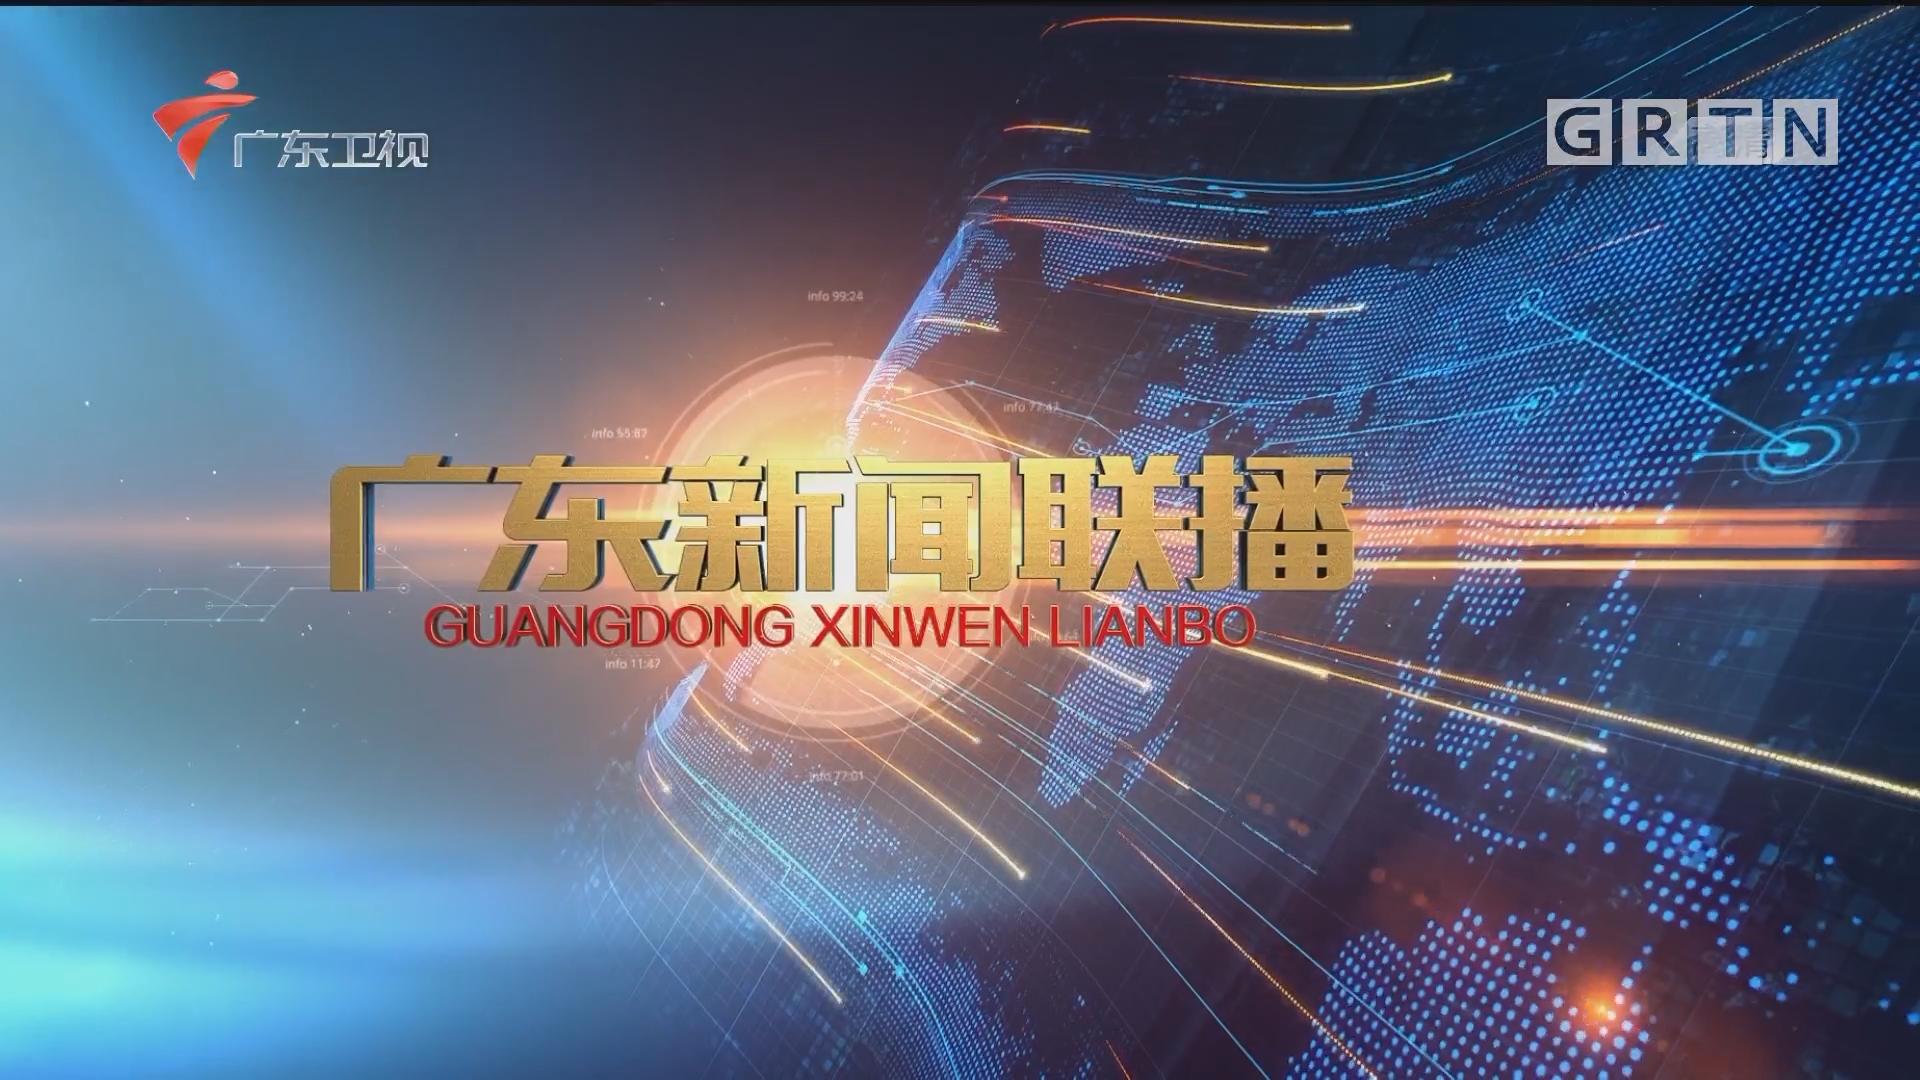 [HD][2017-12-13]广东新闻联播:南京大屠杀死难者国家公祭仪式在南京举行 习近平出席仪式 俞正声讲话